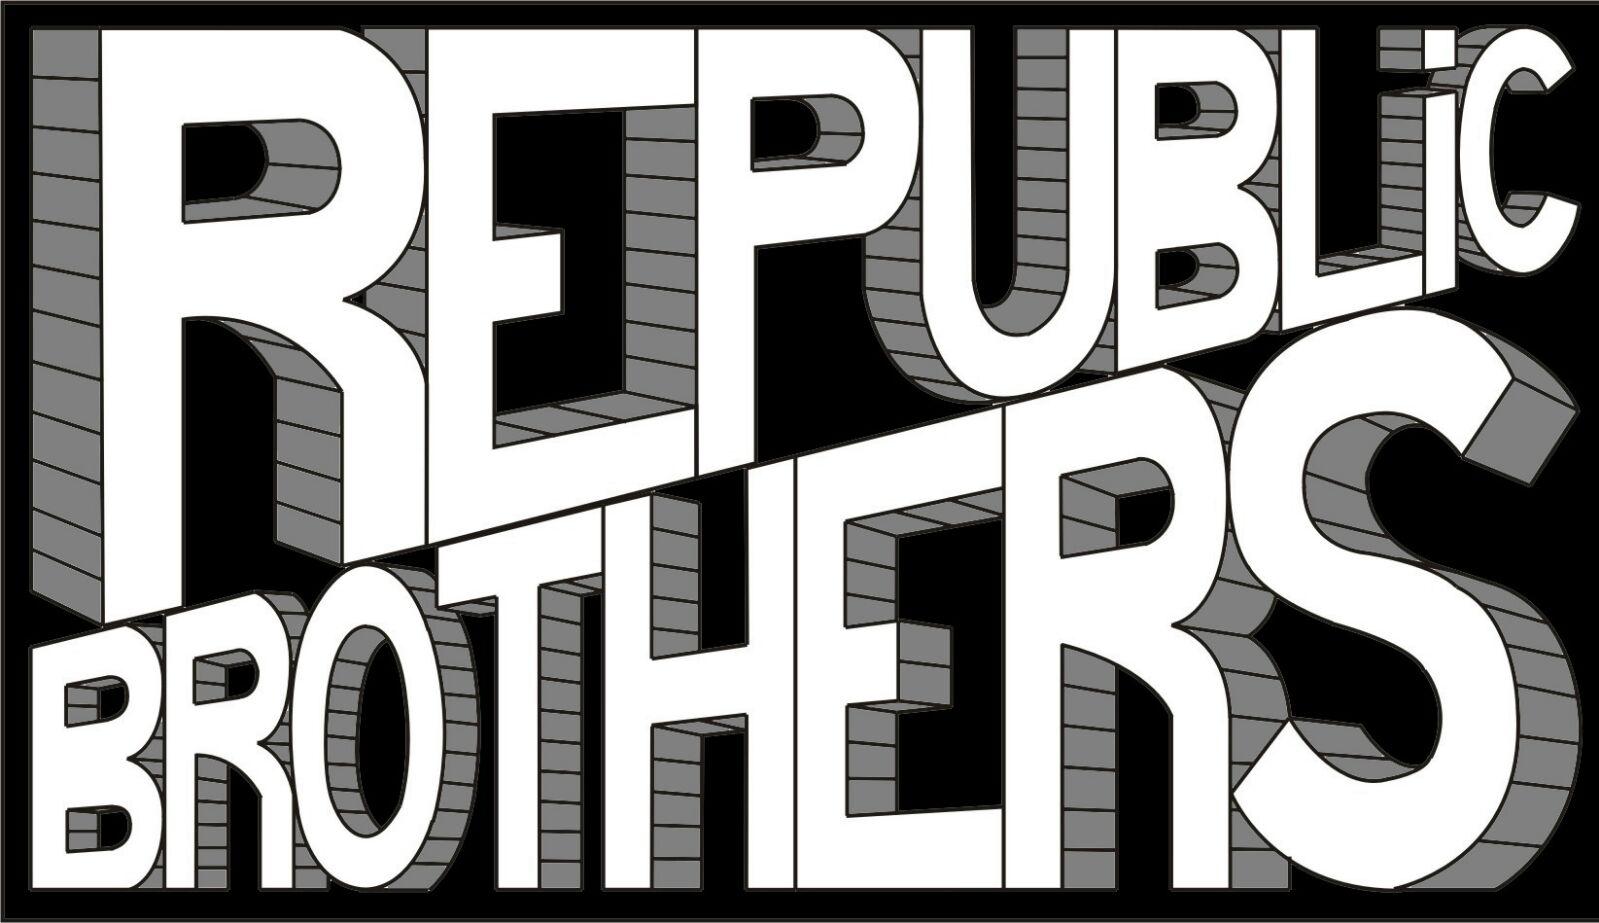 REPUBLIC BROTHERS